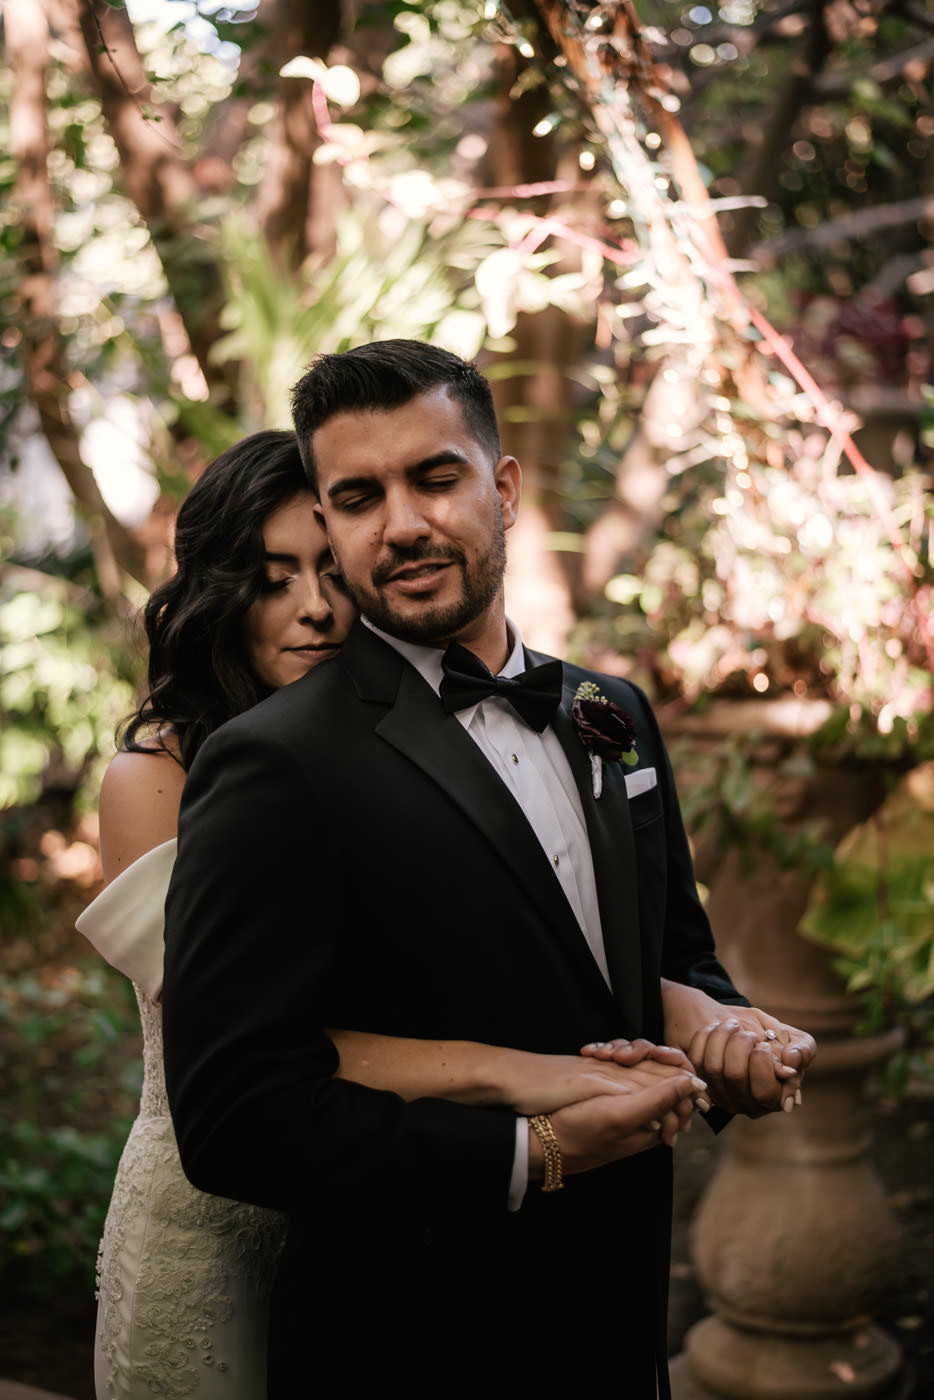 eden-gardens-wedding-photographer-romantic-28.jpg